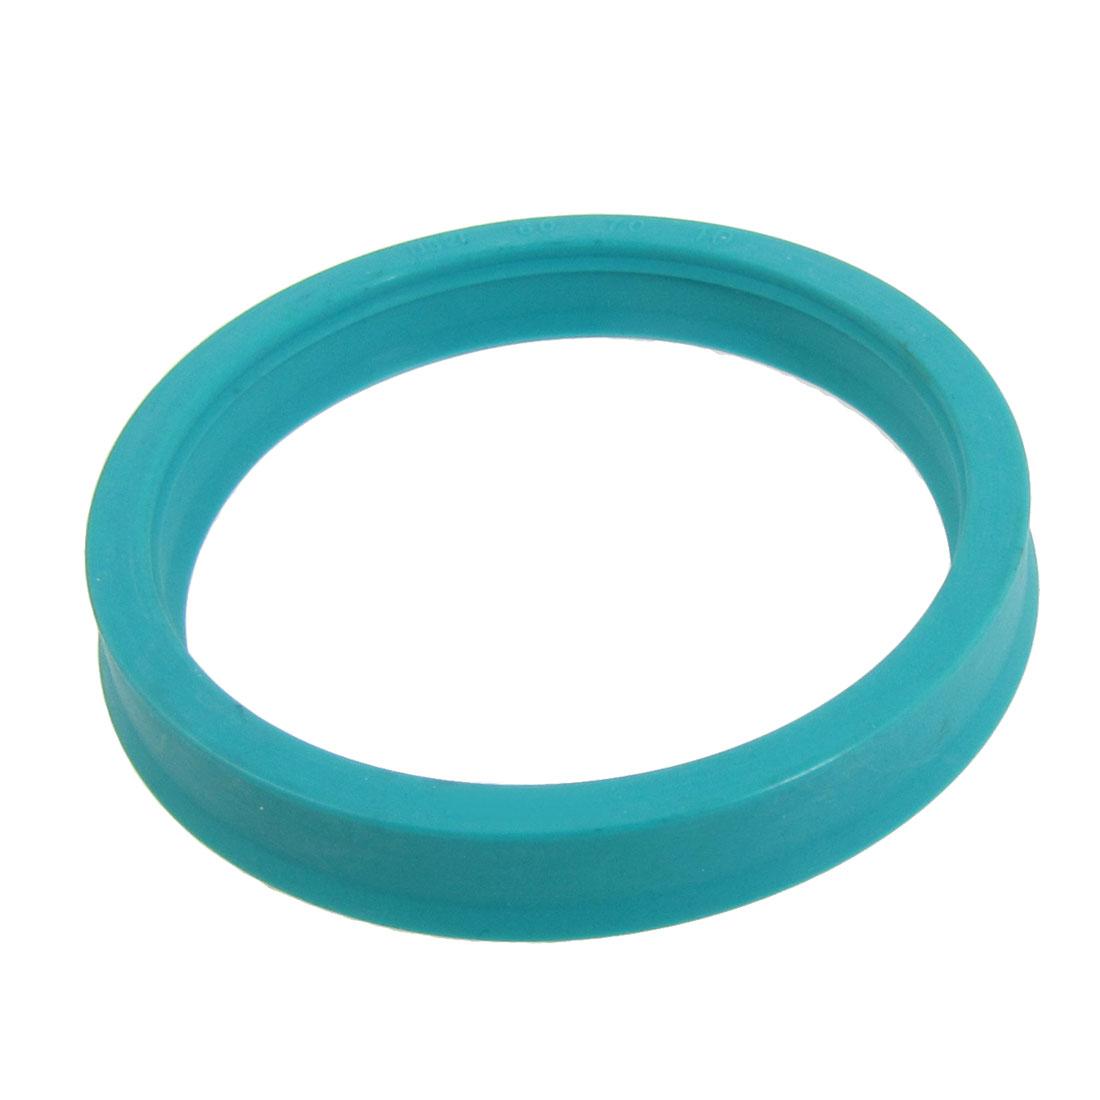 Cyan Blue U32i Single Lip Metric Hydraulic Rod U Cup PU Oil Seal Ring 60x70x10mm